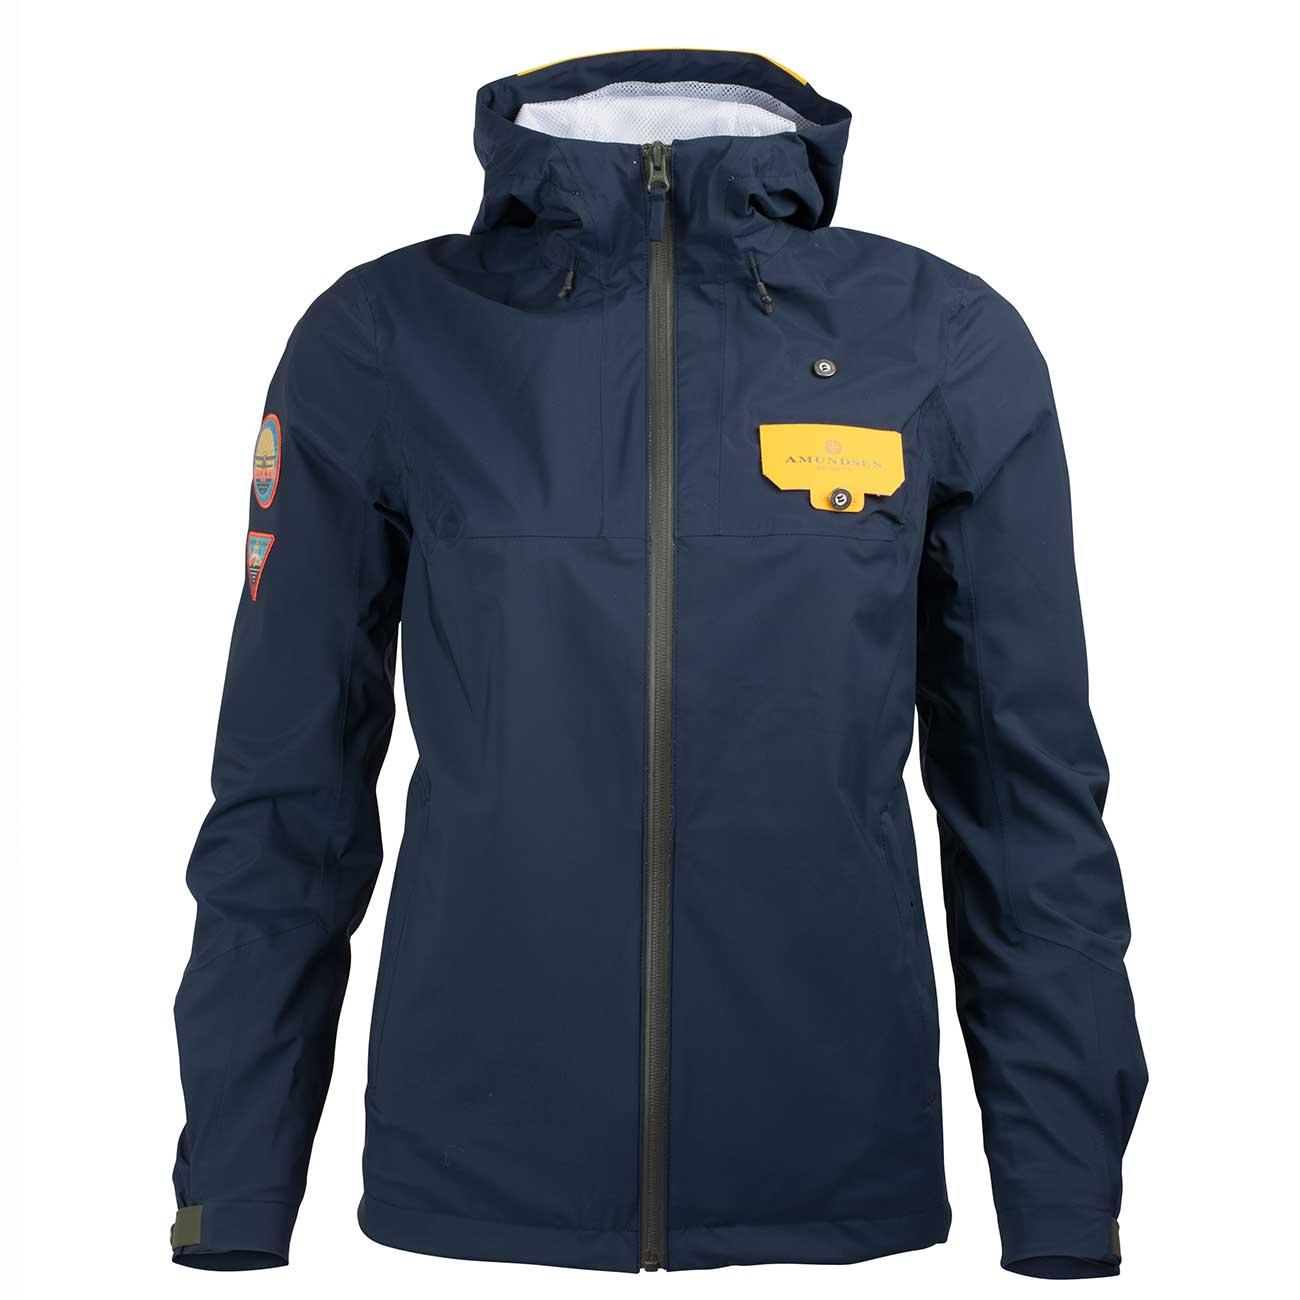 Amundsen Sports Off Trail Rain Jacket, W's